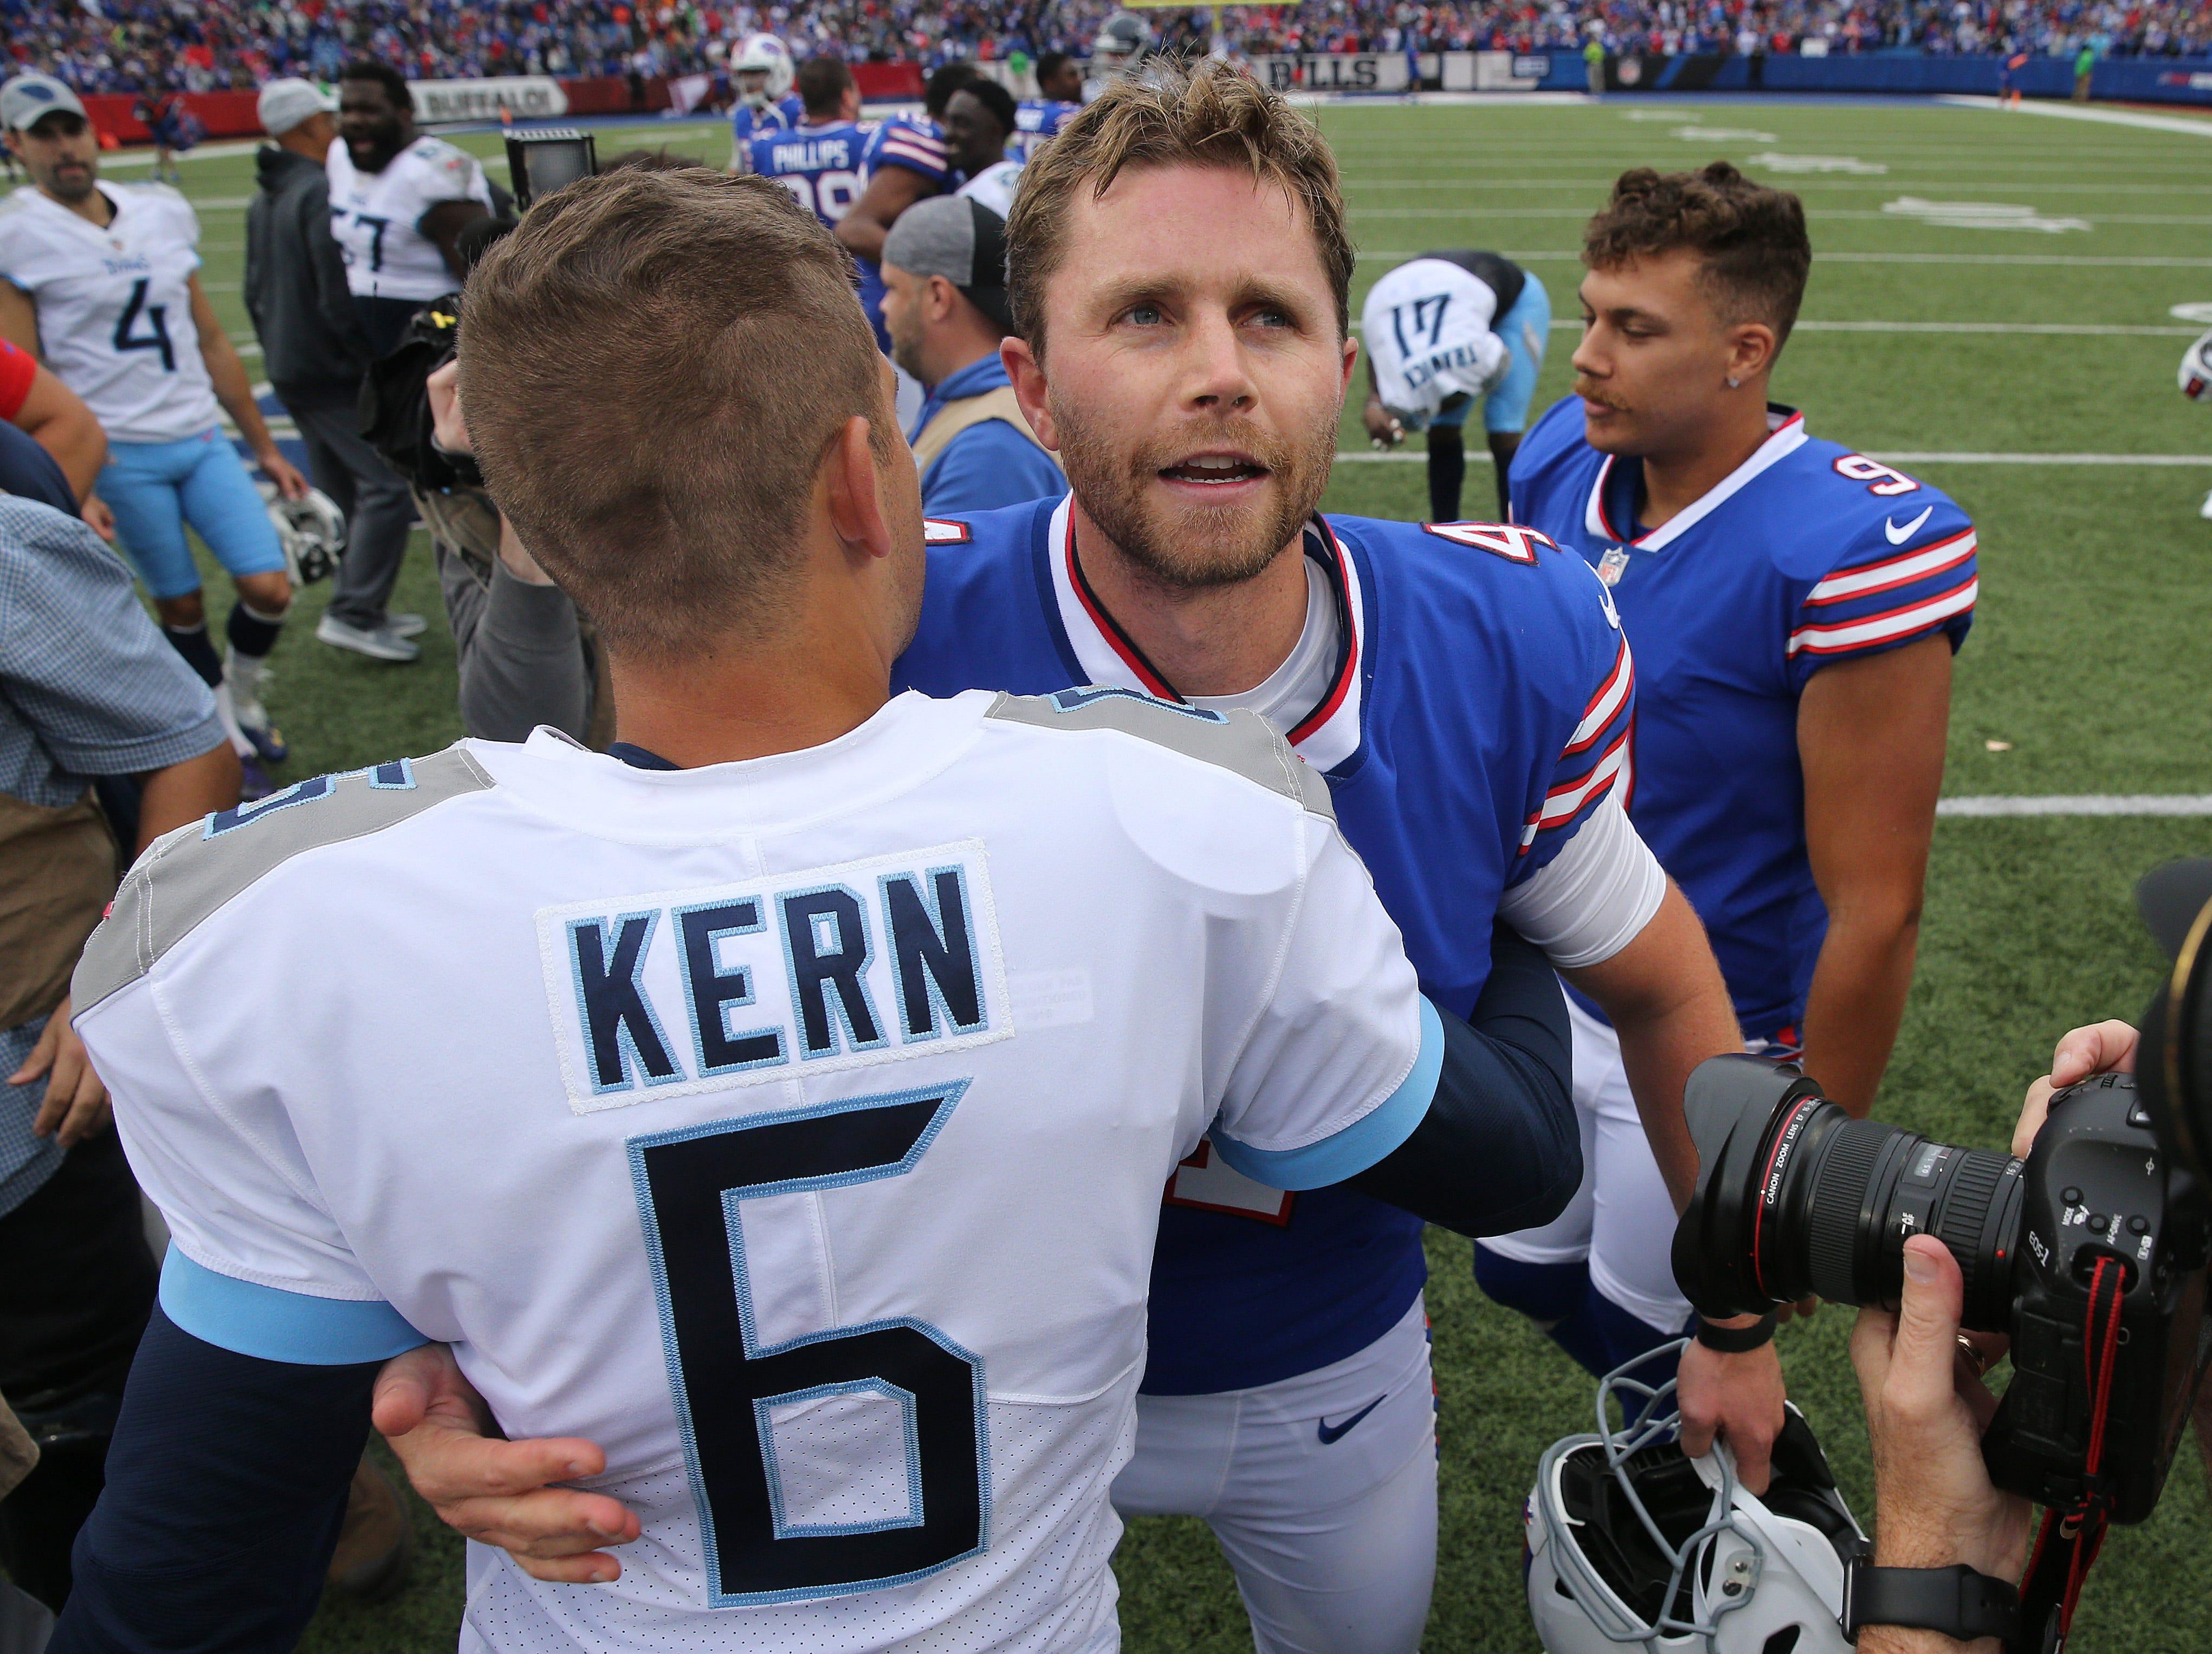 Bills kicker Stephen Hauschka meets with Titans punter Brett Kern after Hauschka's late field goal won the game 13-12.